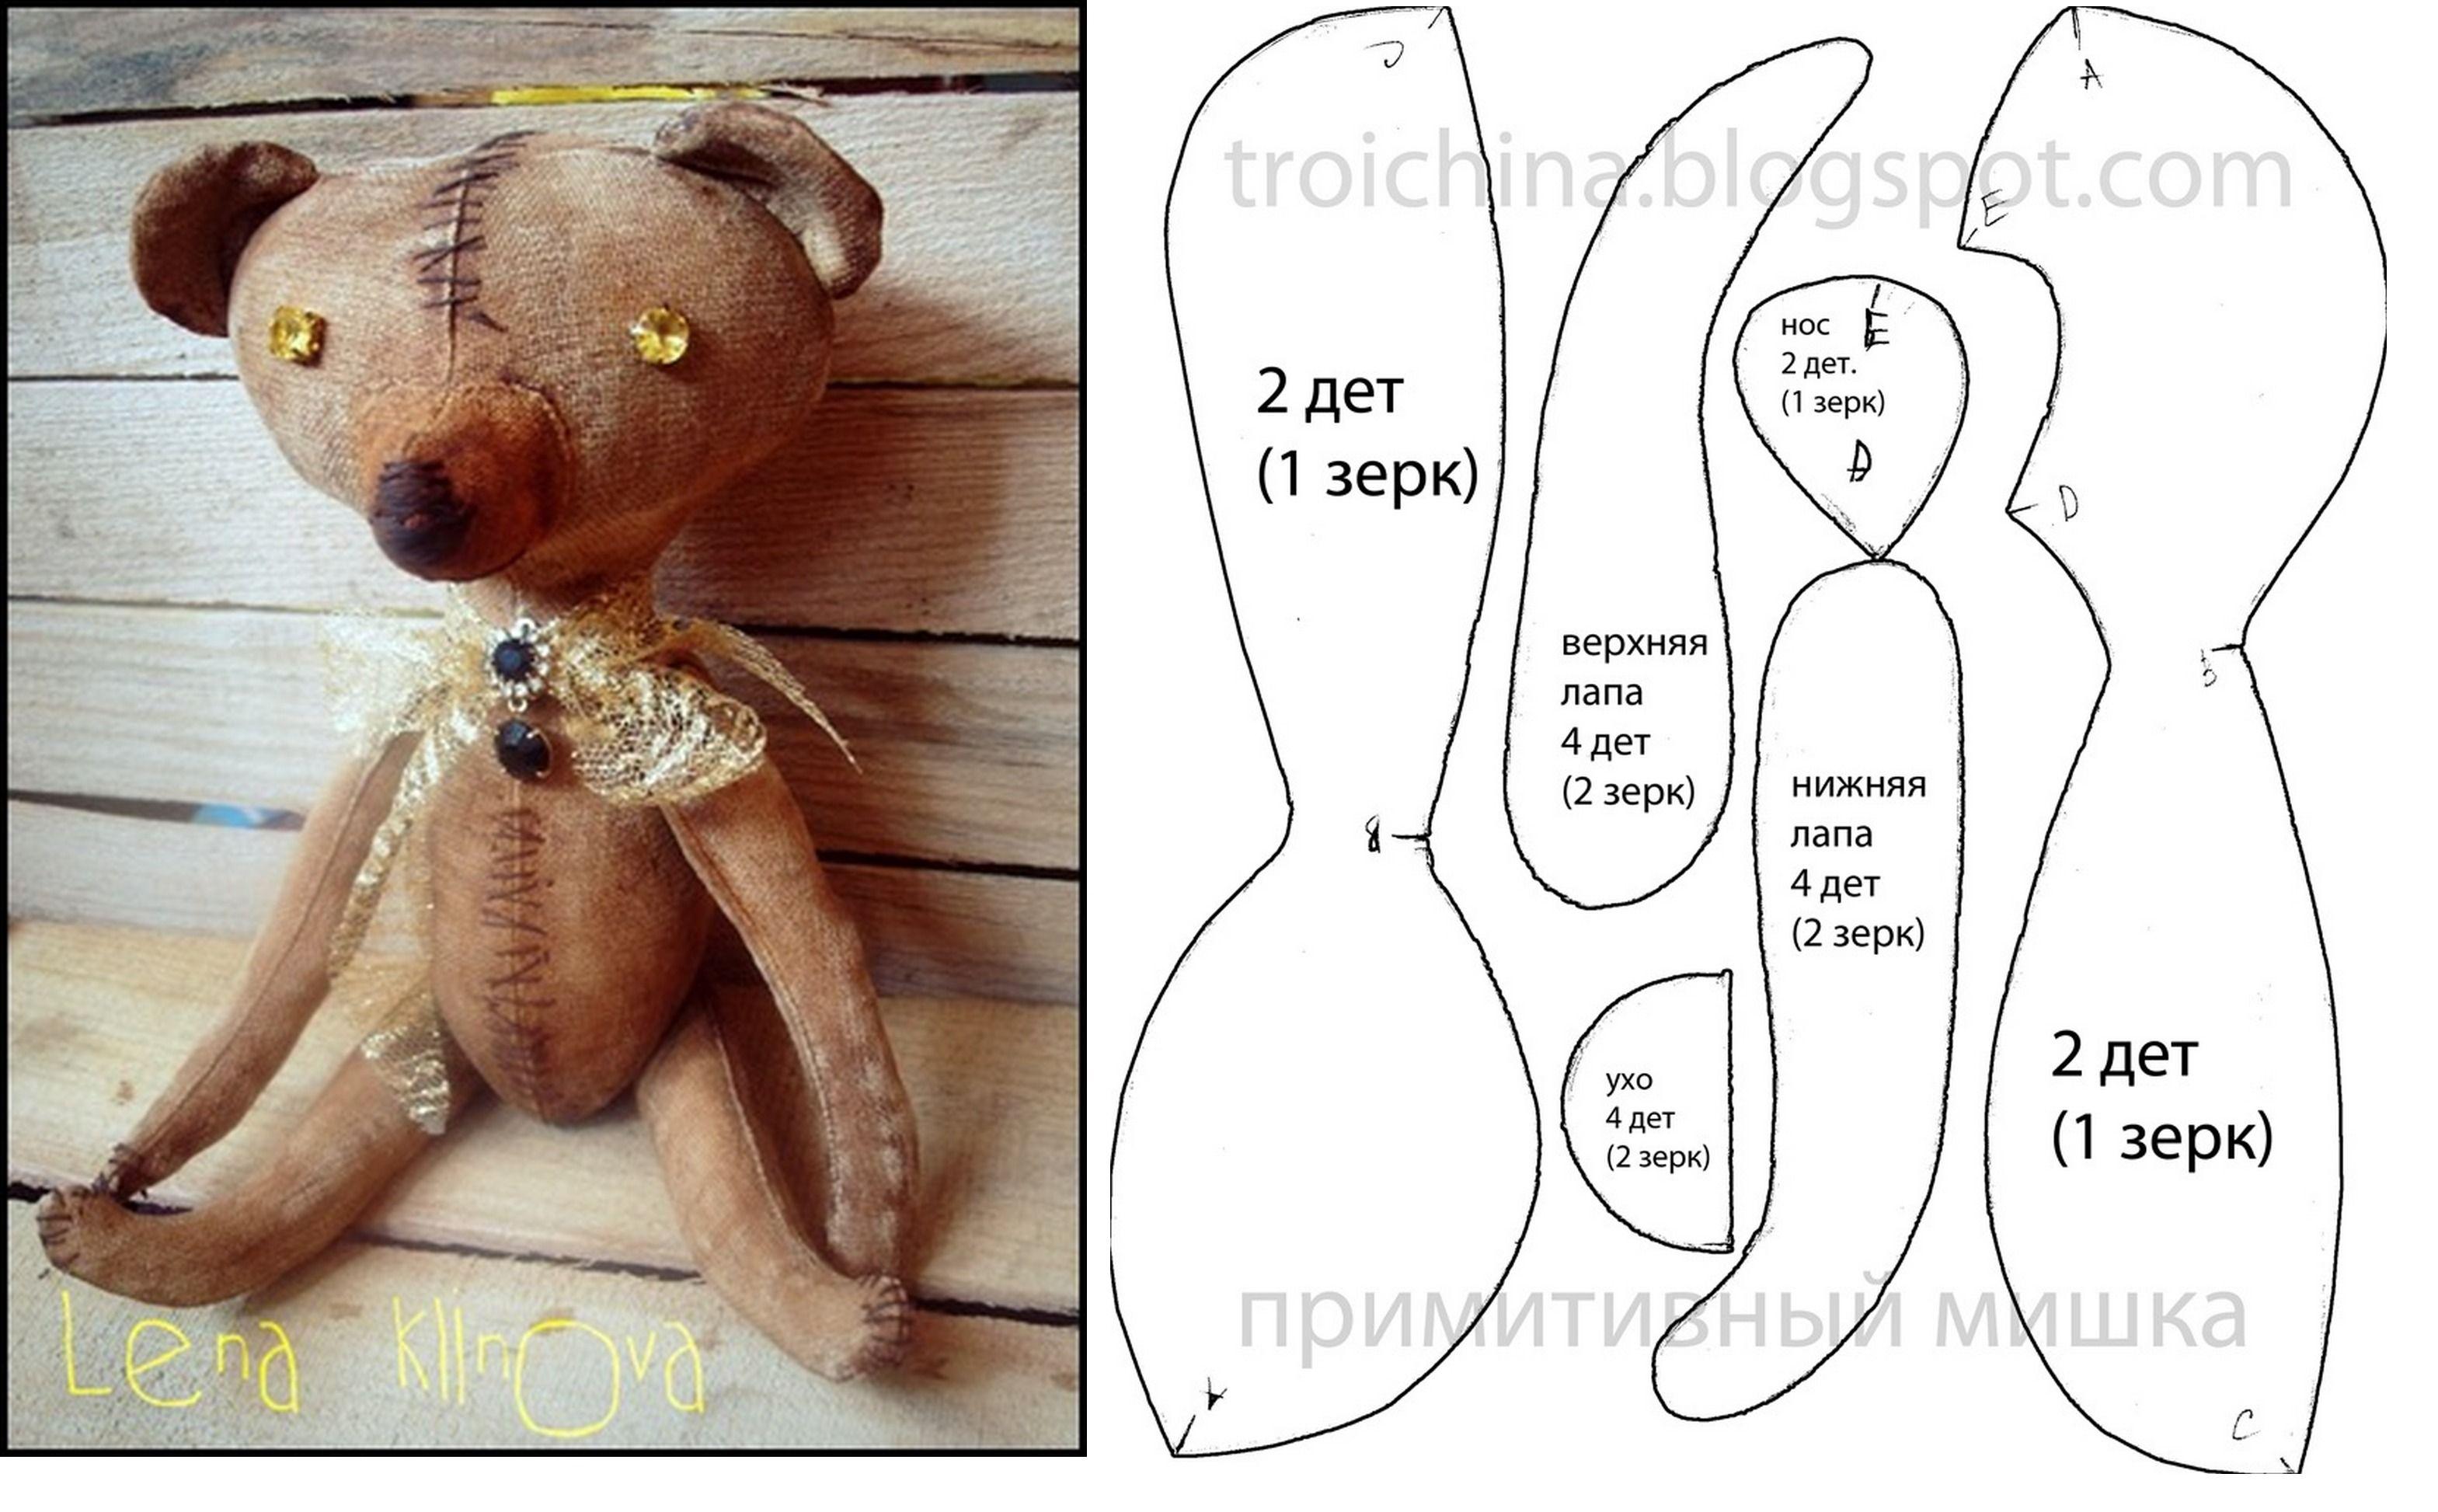 Pin de Nadine en Teddy bear | Pinterest | Moldes de muñecas ...